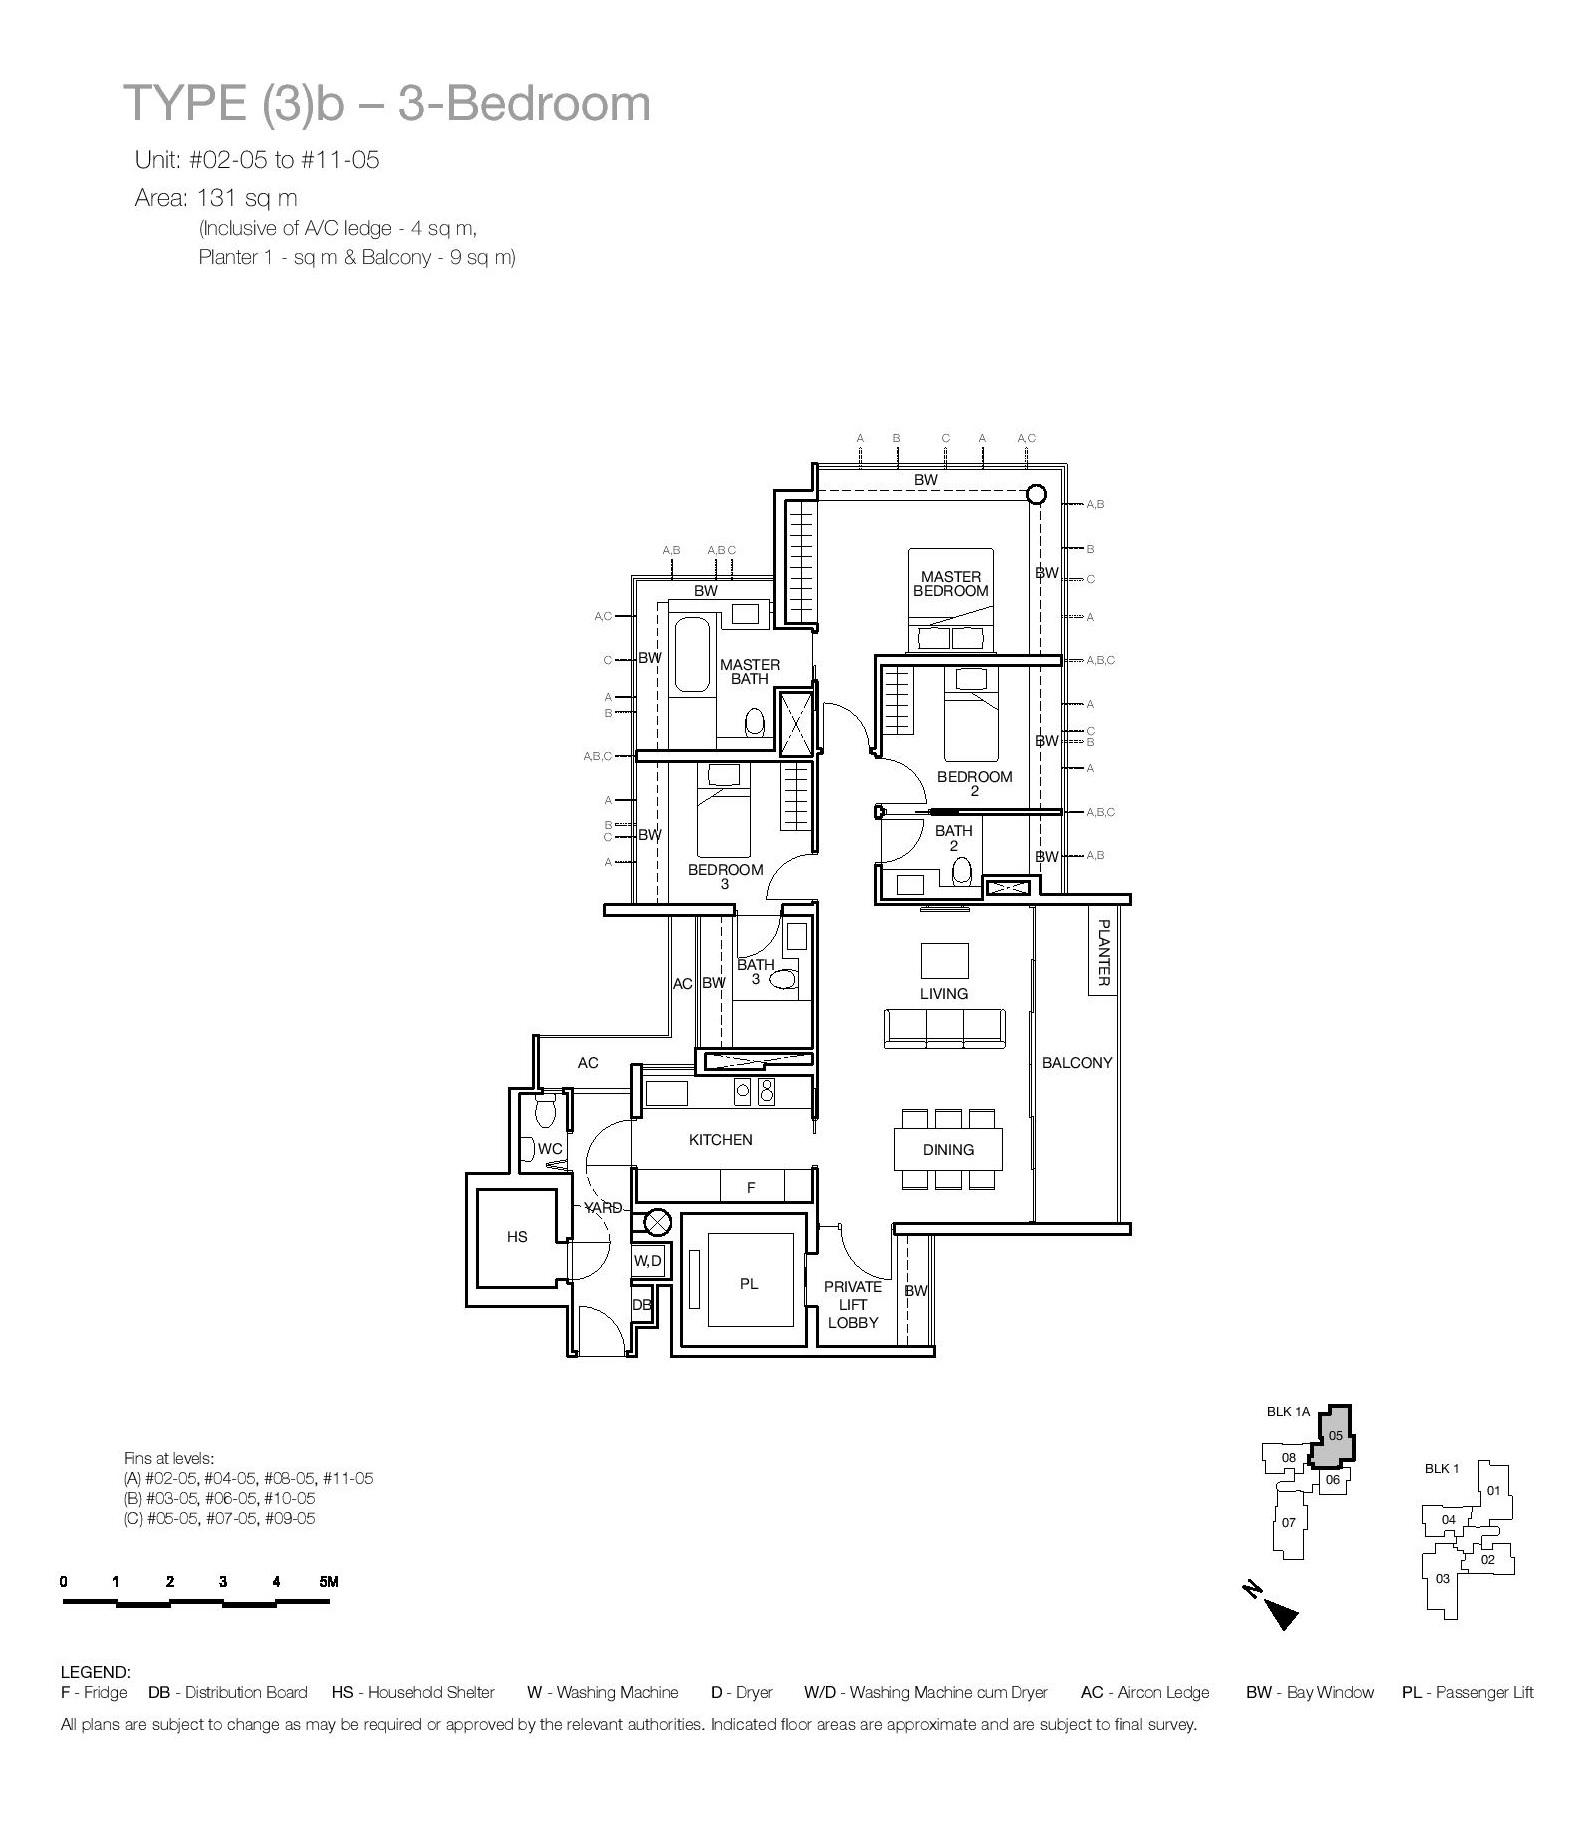 One Balmoral 3 Bedroom Floor Type (3)b Plans